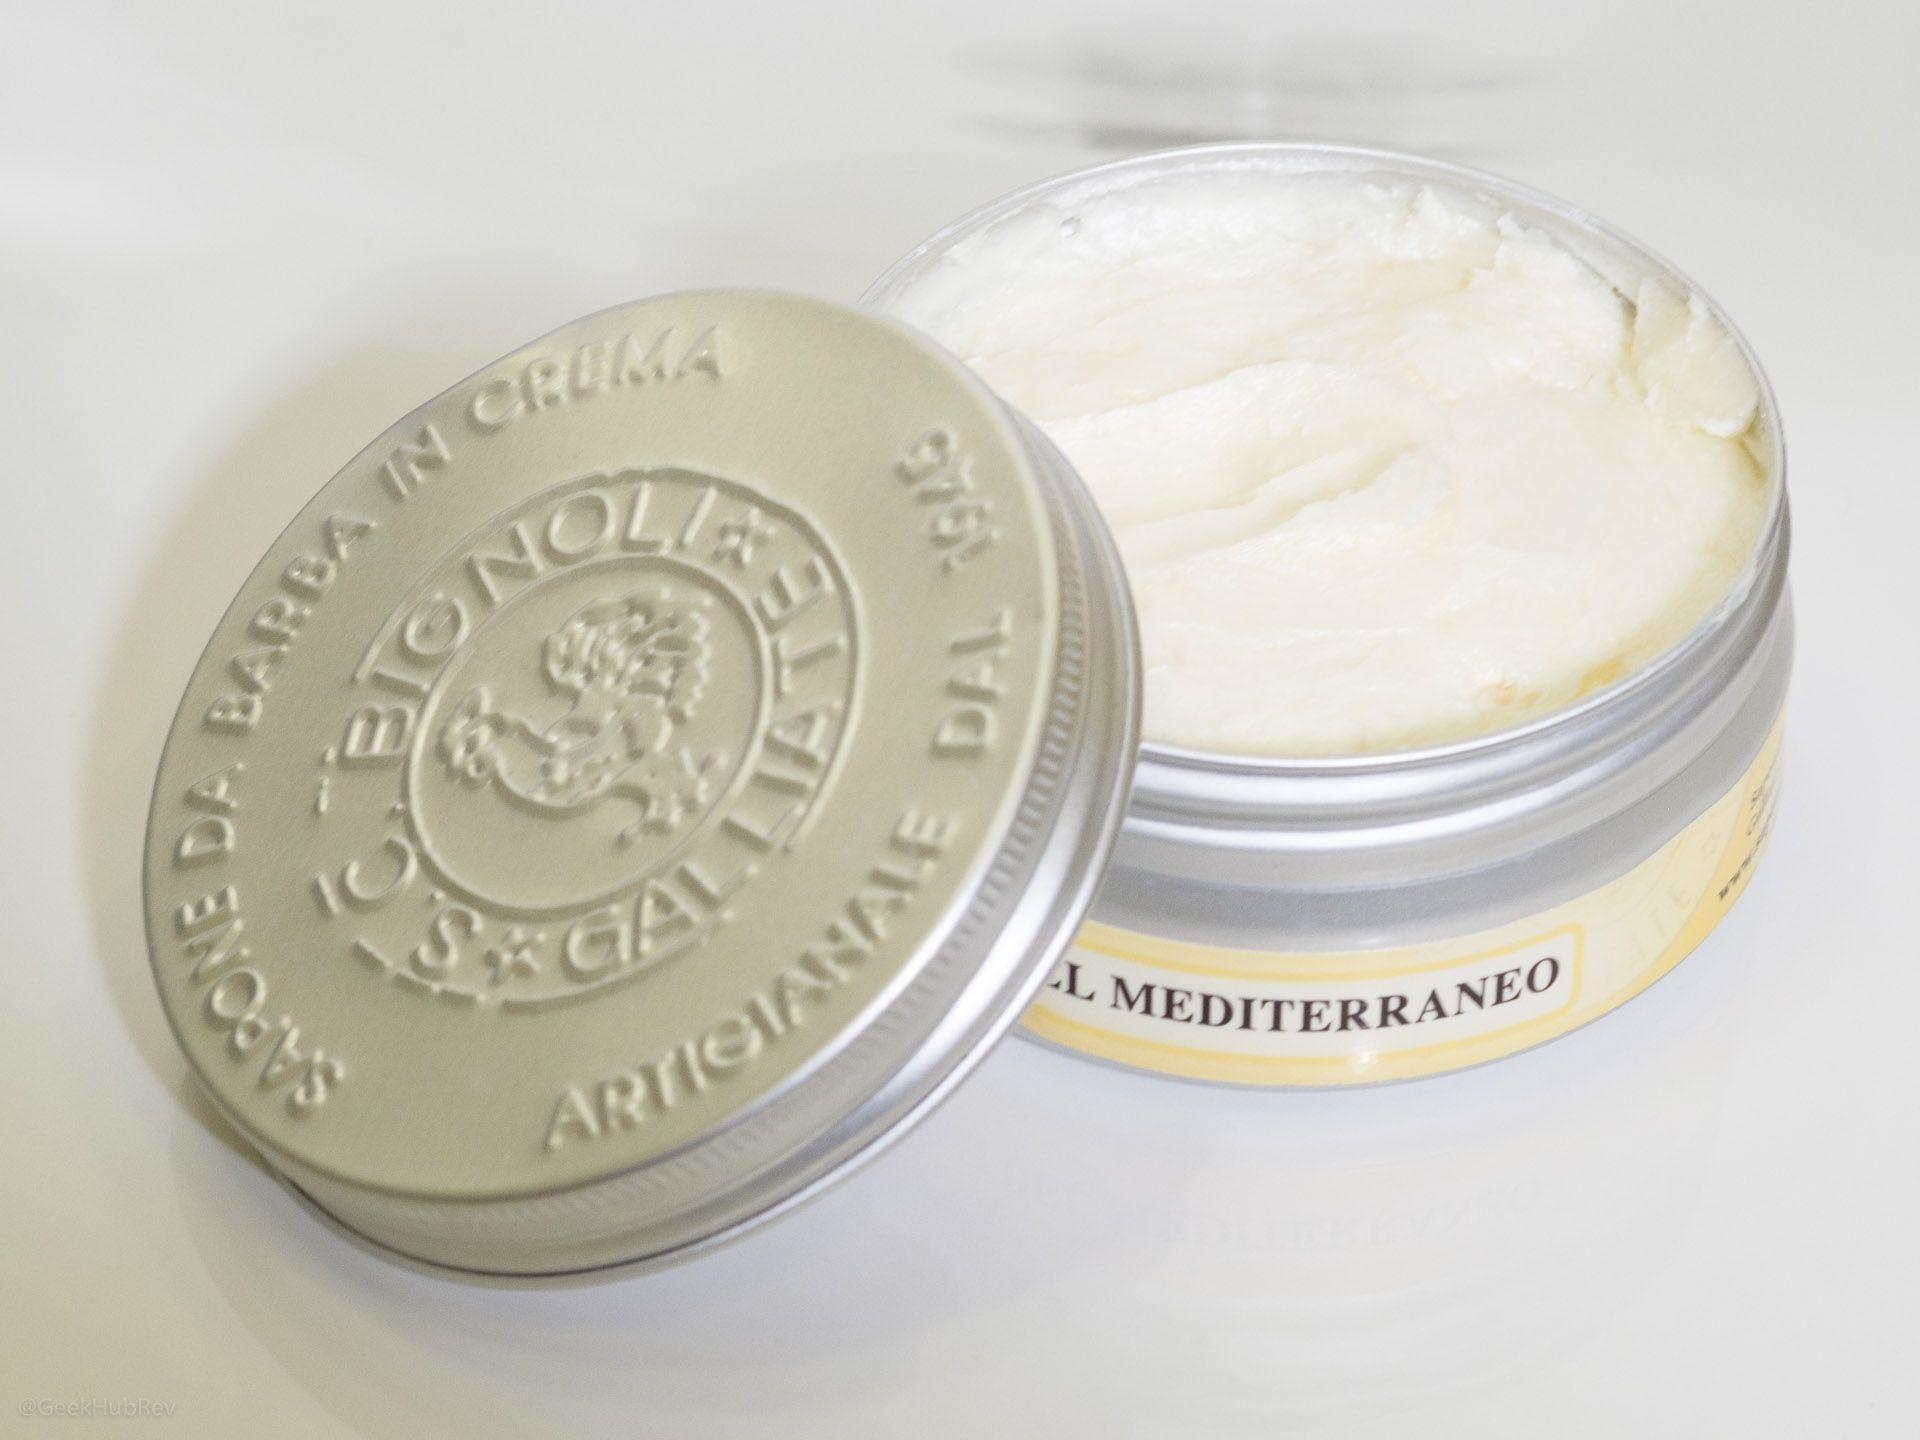 Konsystencja kremu do golenia Saponificio Bignoli Agrumi del Mediterraneo Shaving Cream